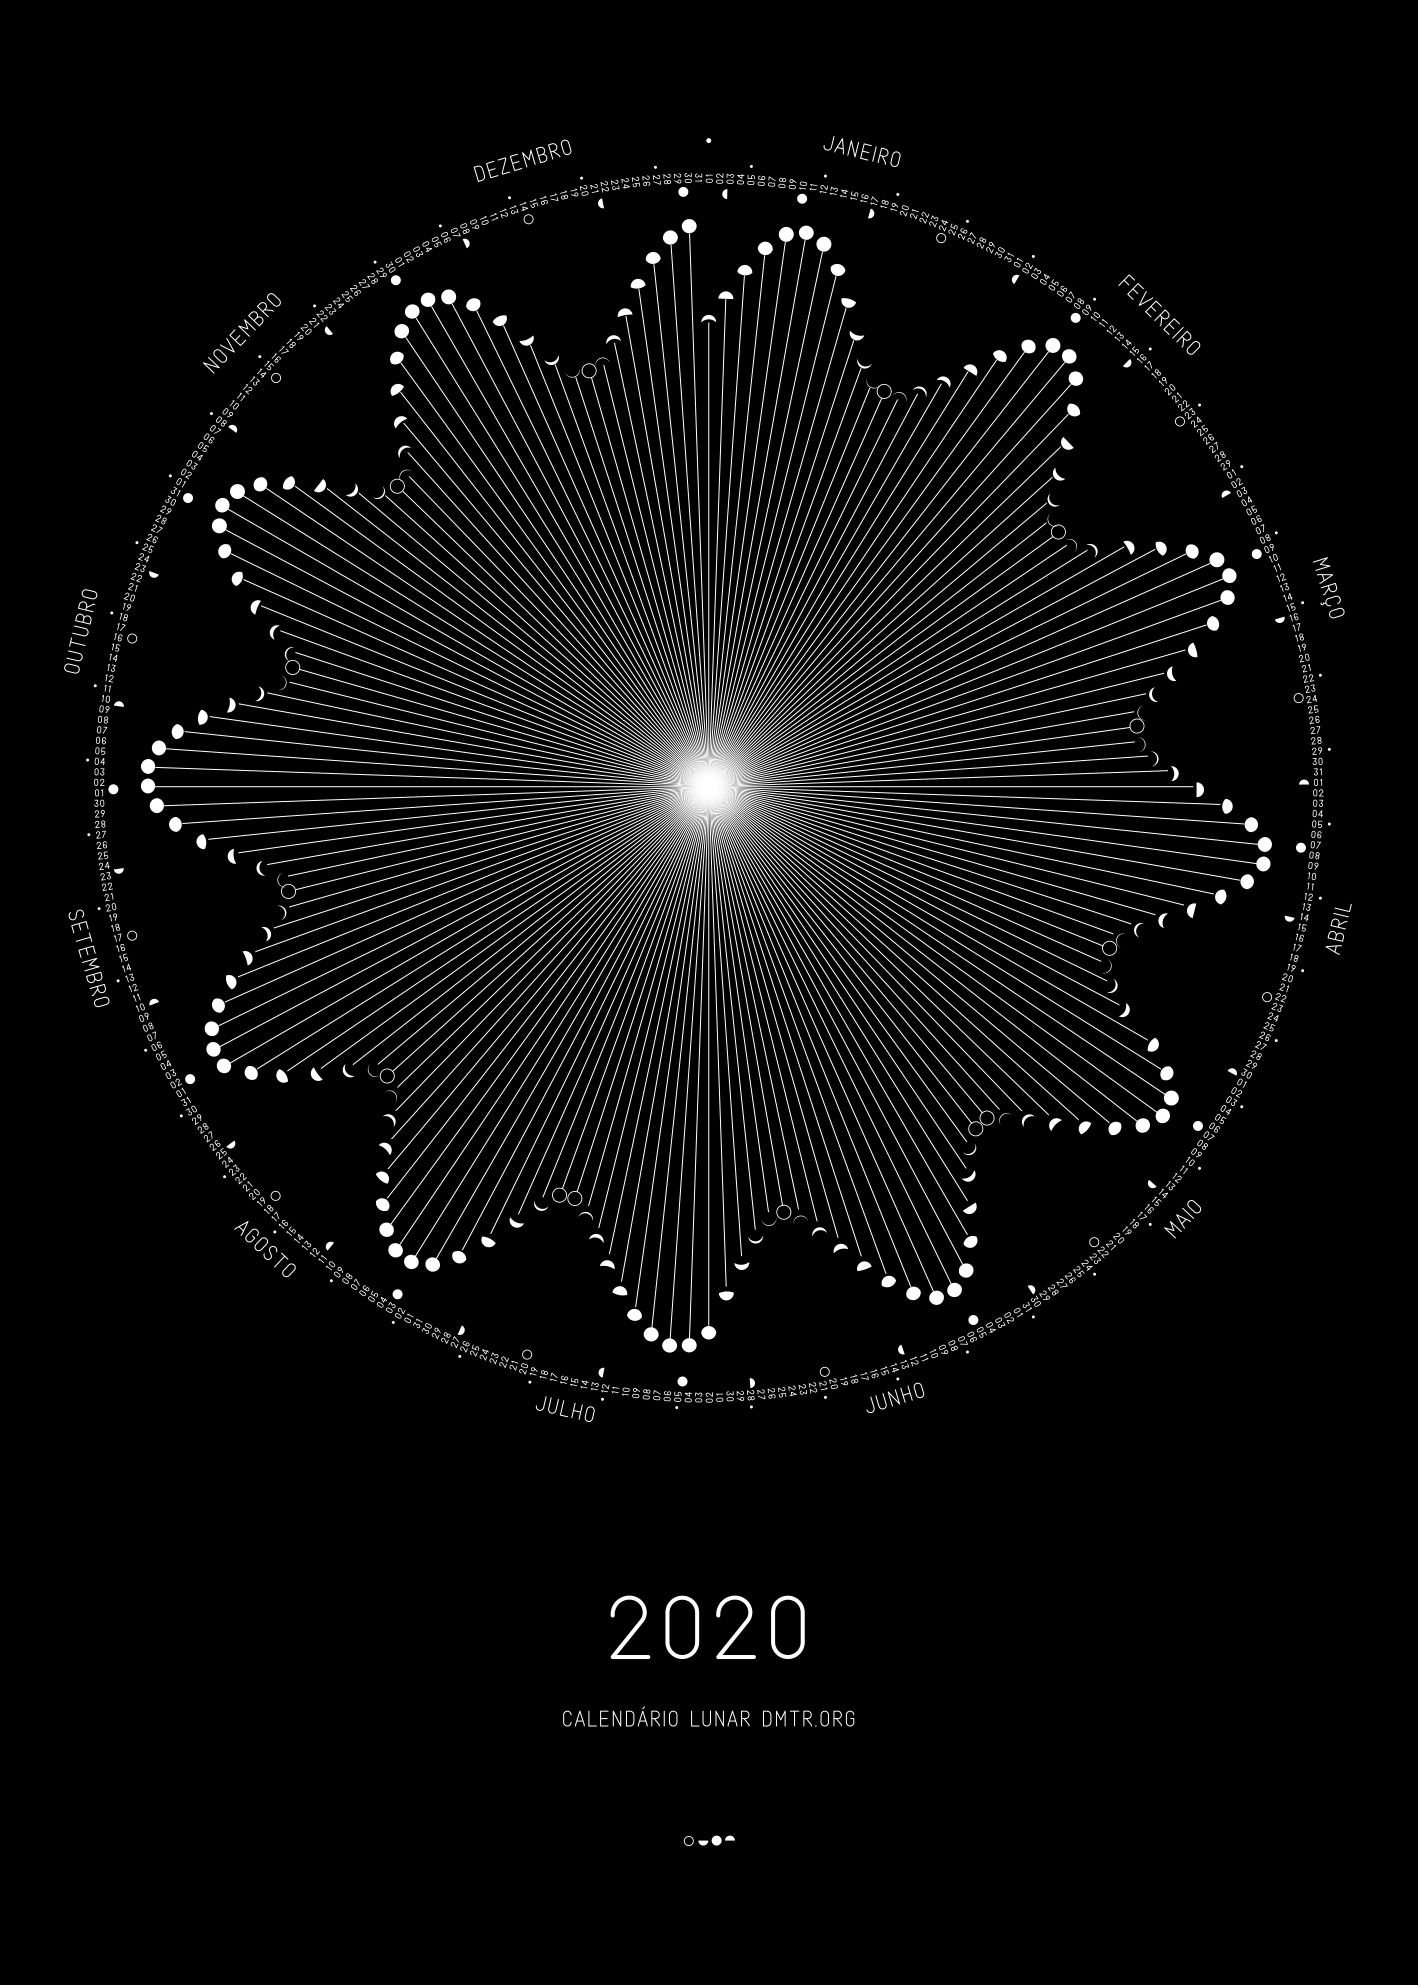 lunarcalendarposter2020_dmtrorg_full.png